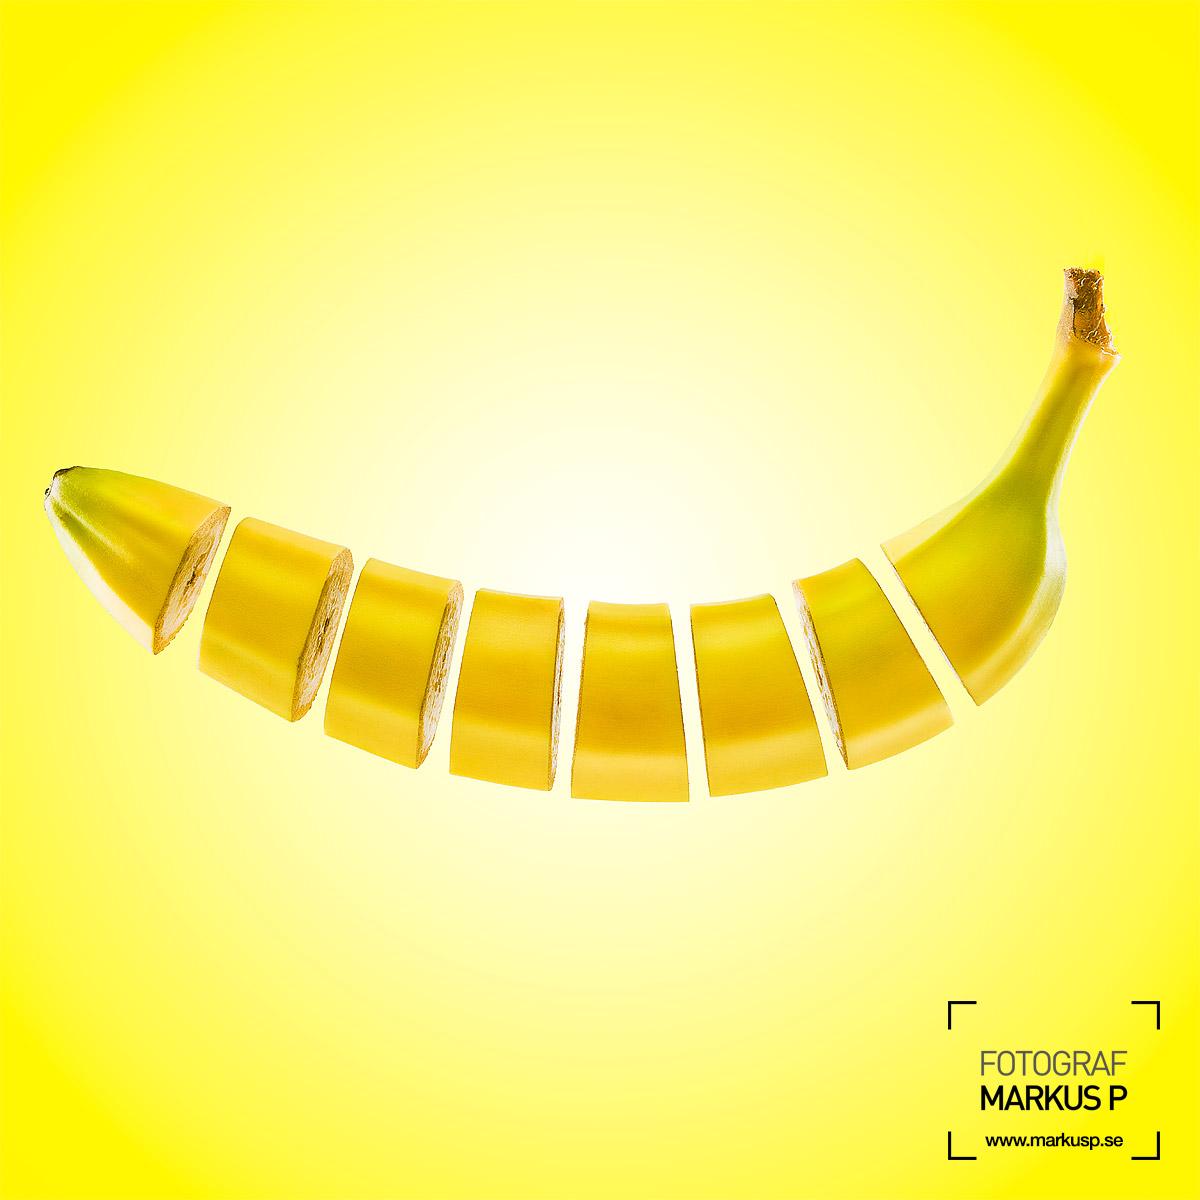 Sliced banana compositing